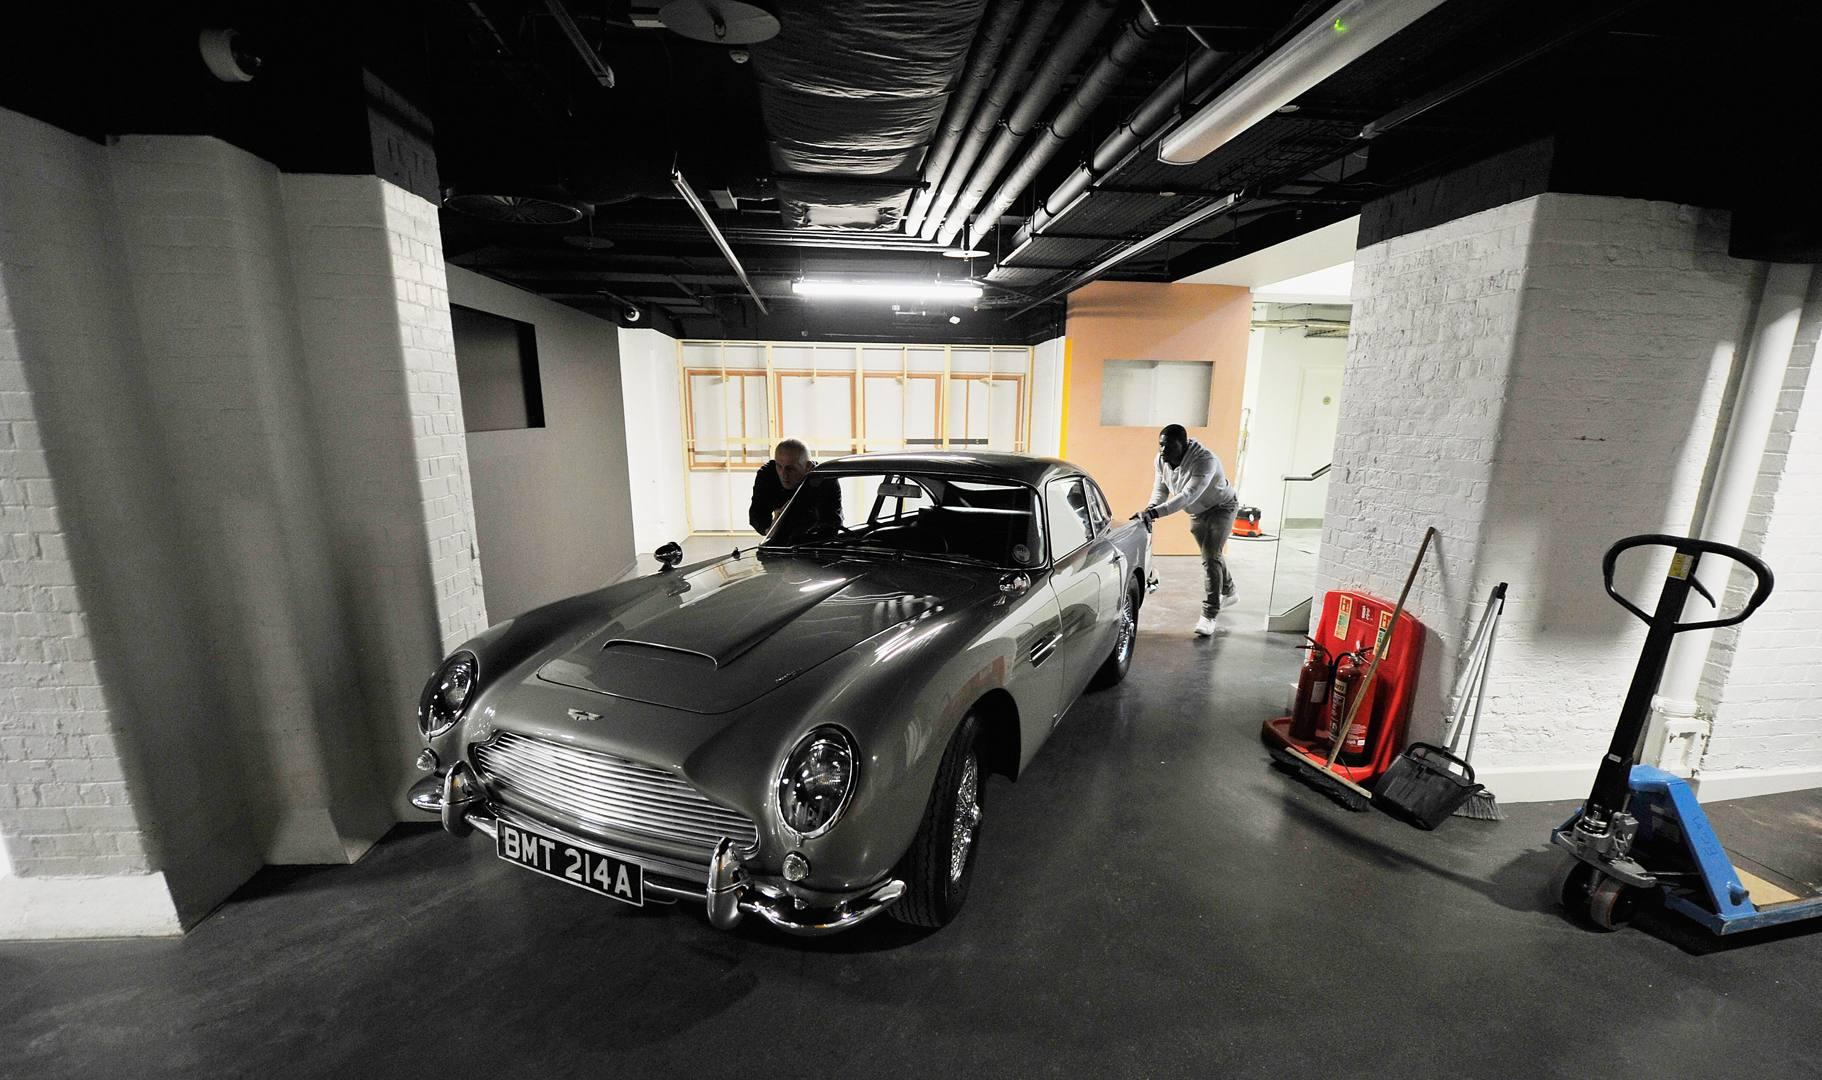 vehicles bond lifestyle - 964×544